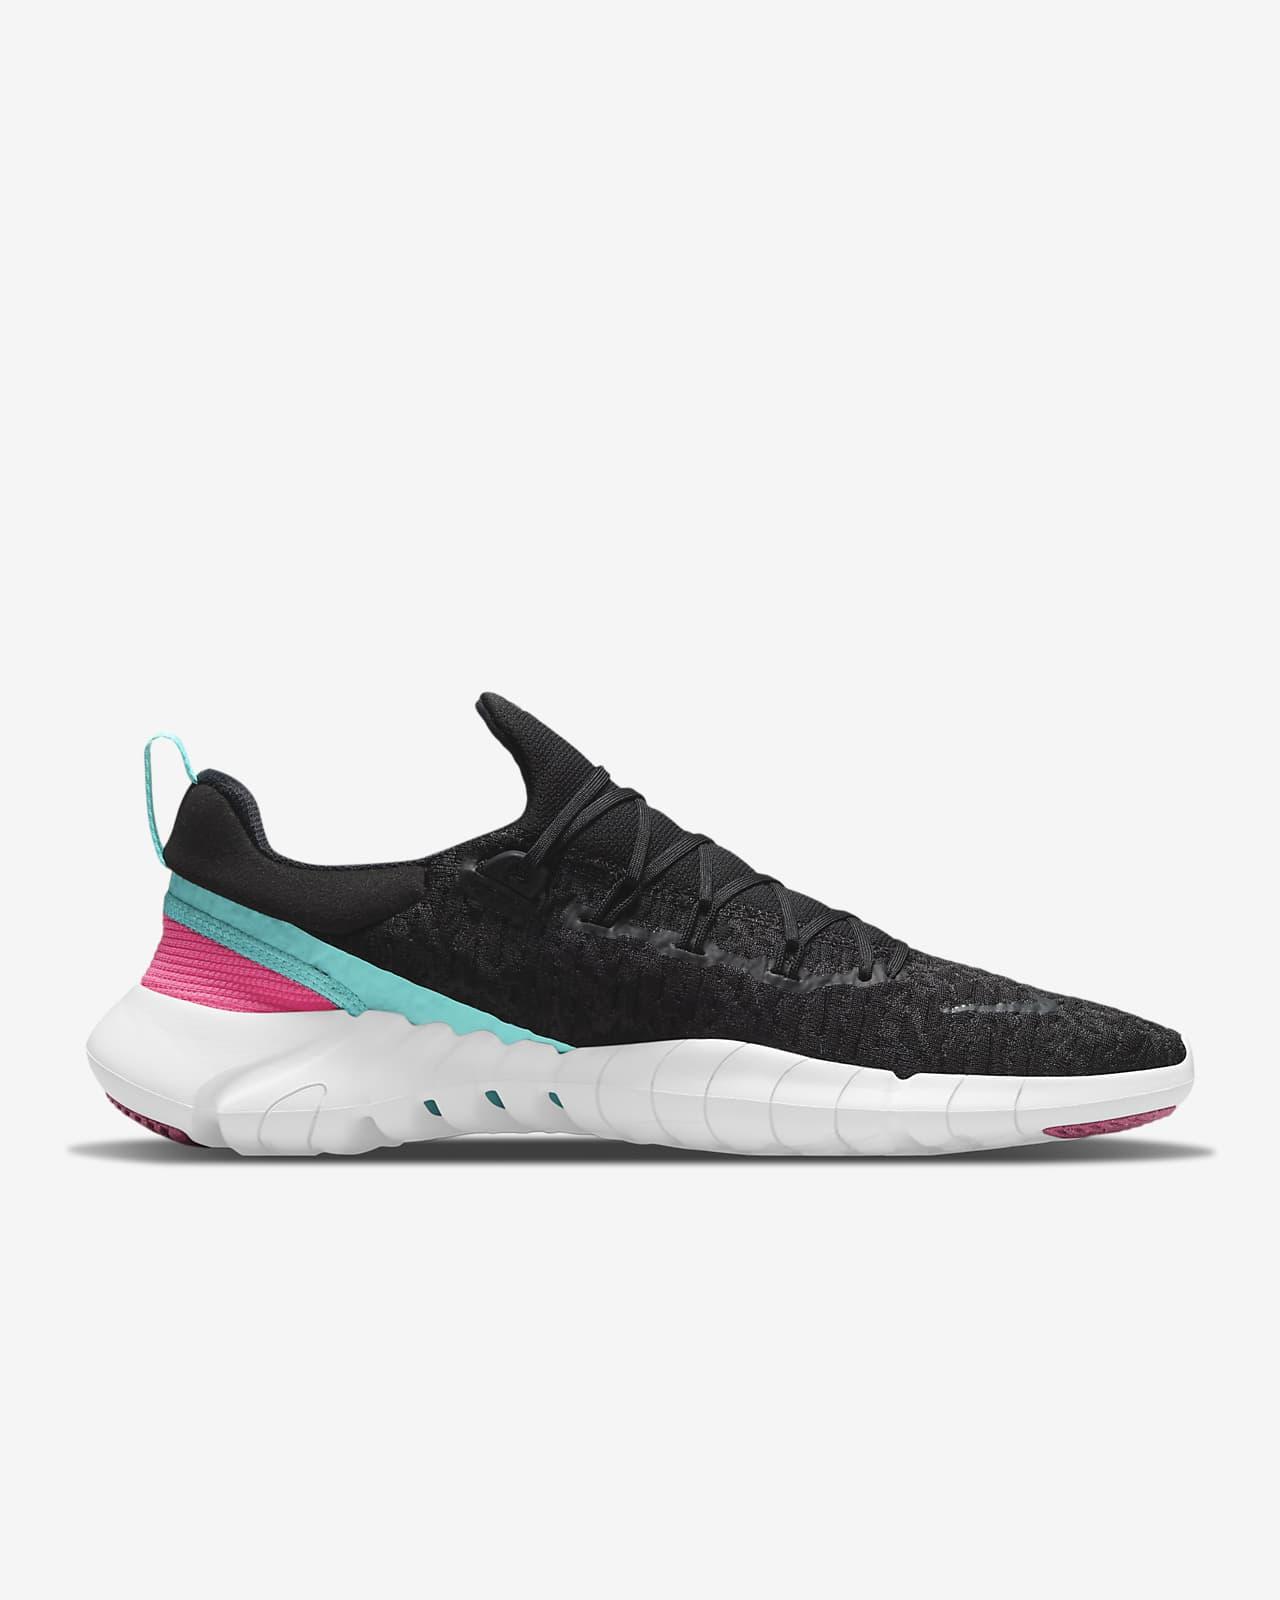 Chaussures de running Nike Free Run 5.0 pour Homme. Nike LU